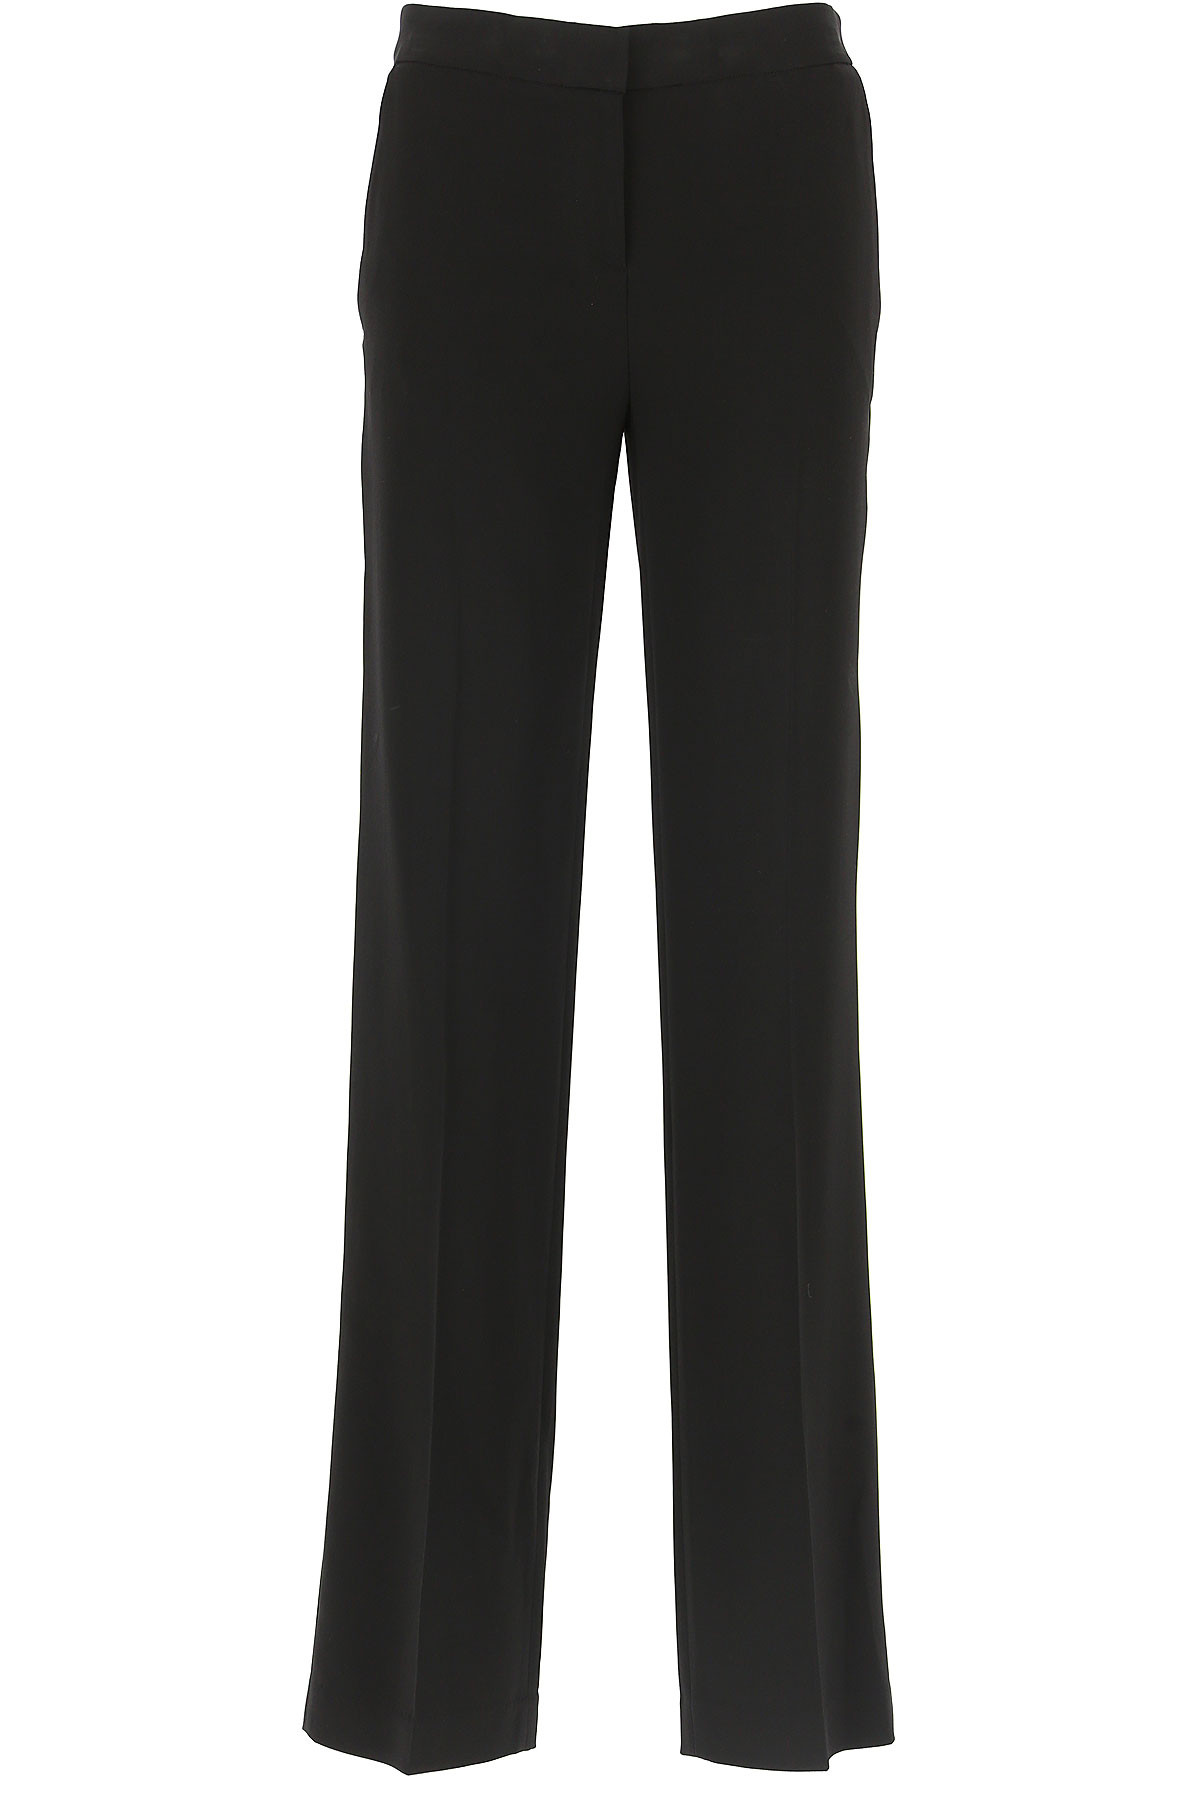 Michael Kors Pantaloni Donna, Nero, Viscose, 2019, 38 40 42 44